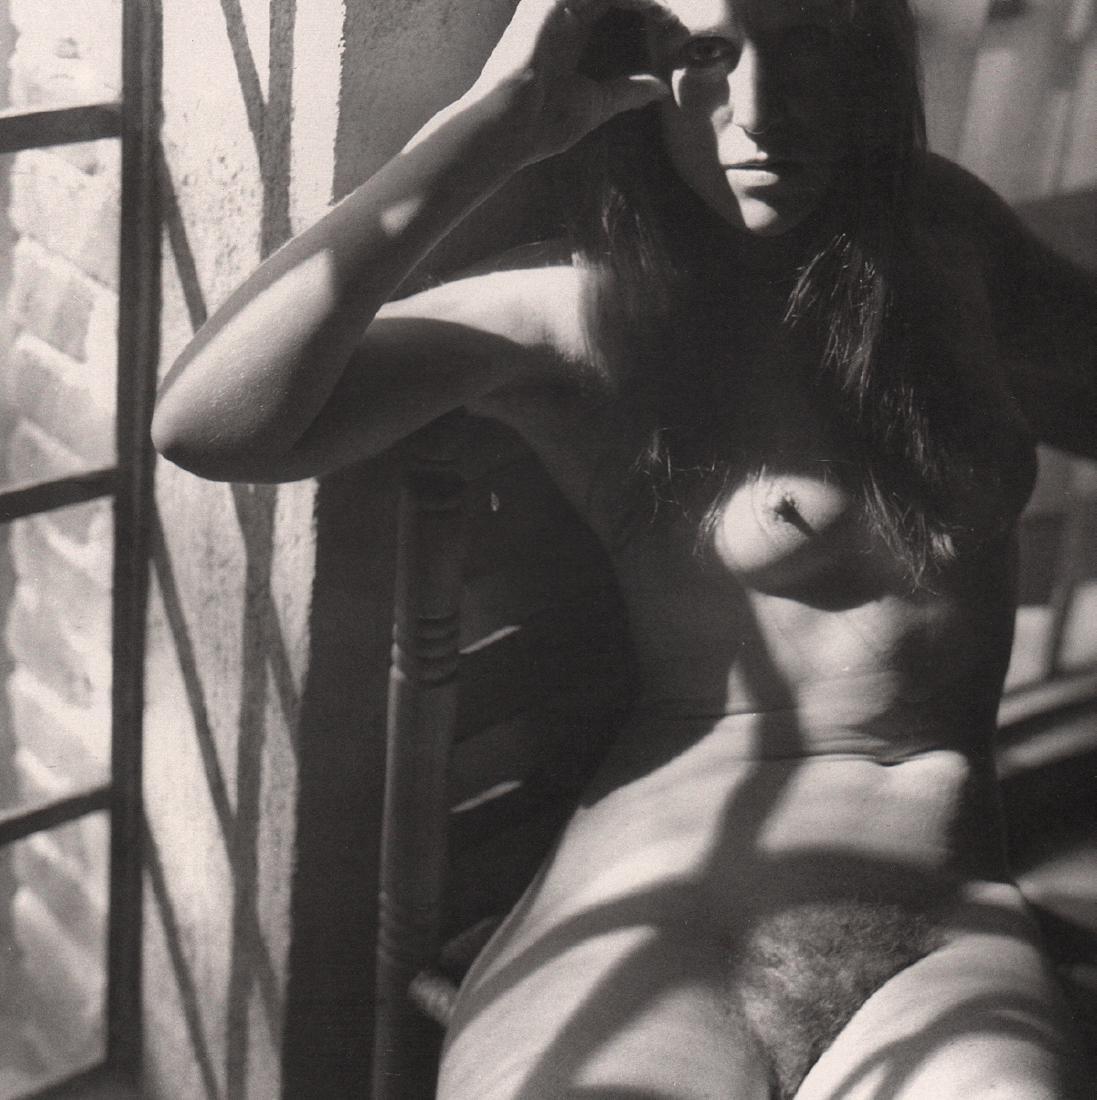 MANUEL ALVAREZ BRAVO - Nude, 1978